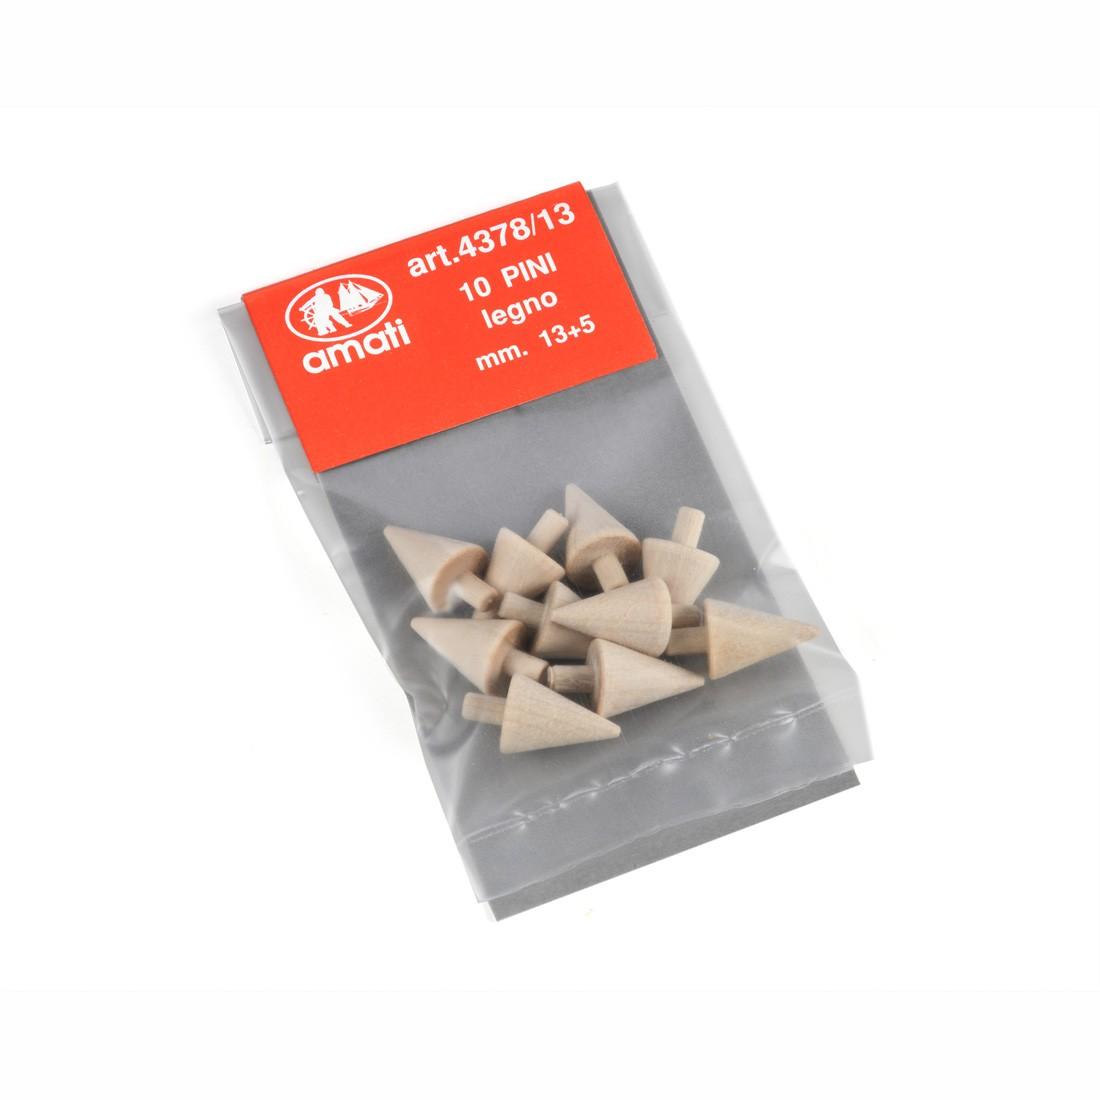 Mini pinos mm.13 + 5